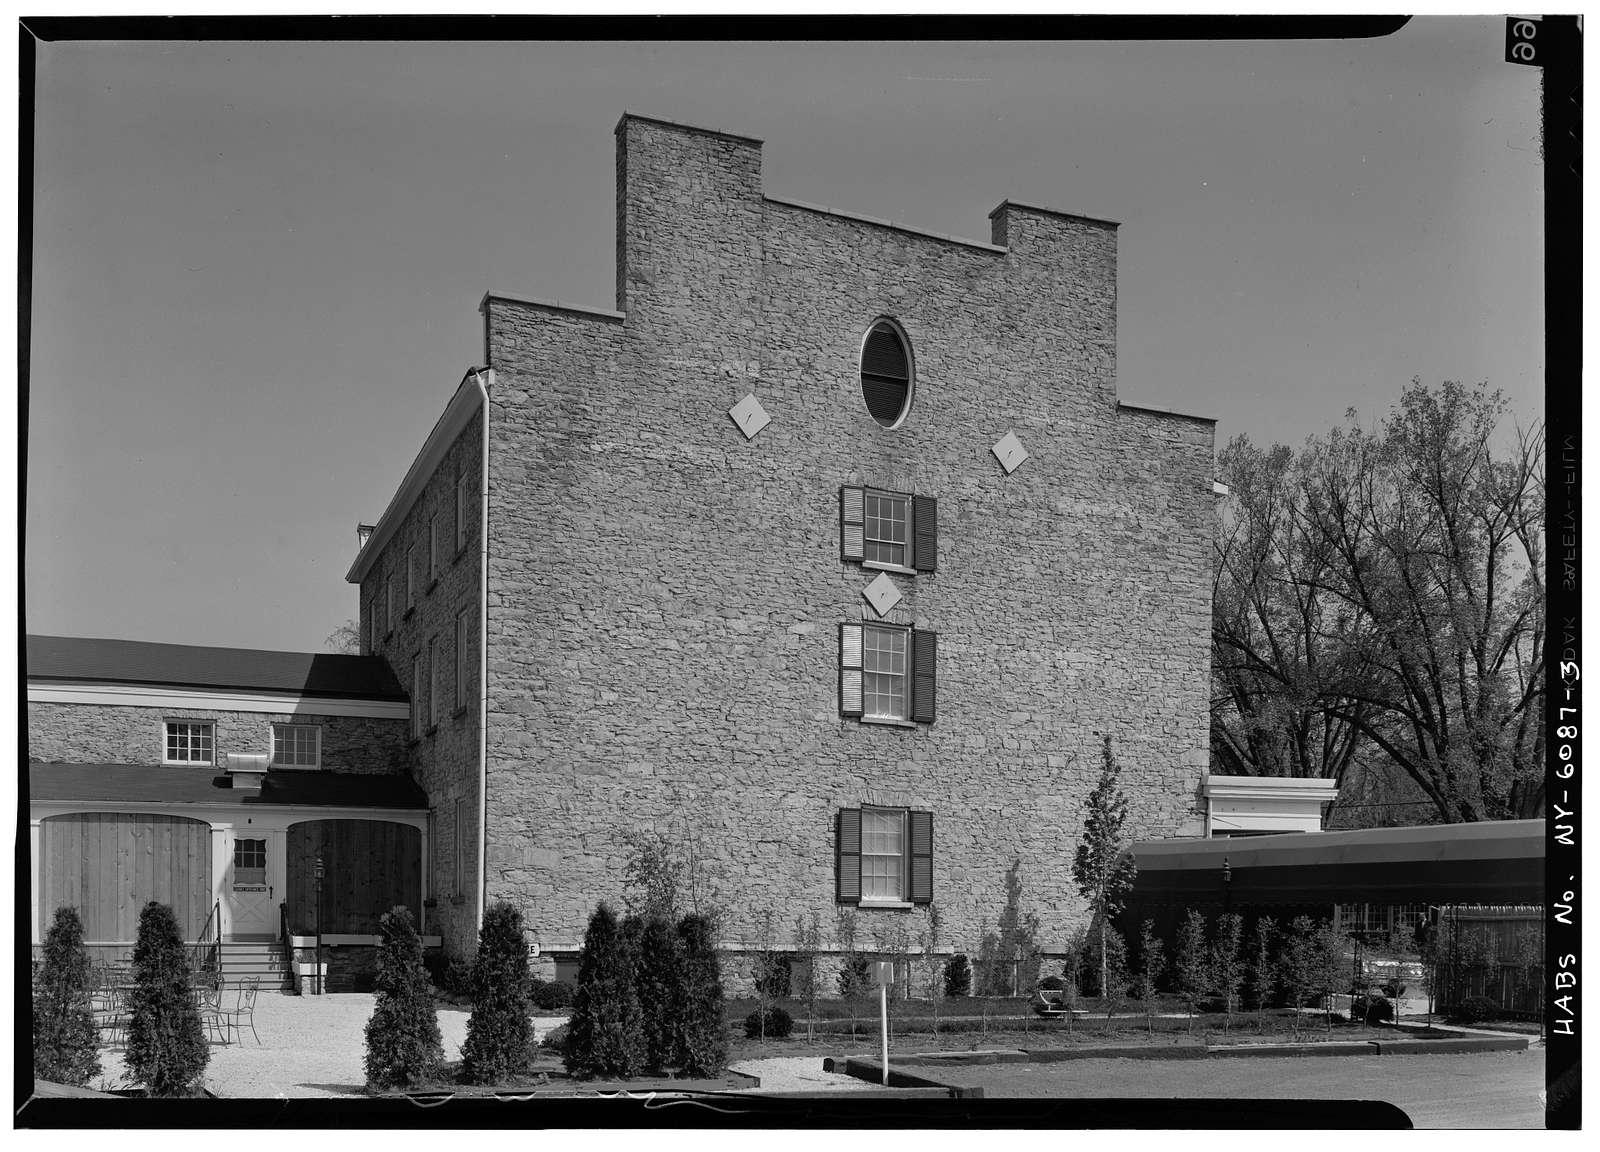 Frontier House, 450 Center Street, Lewiston, Niagara County, NY